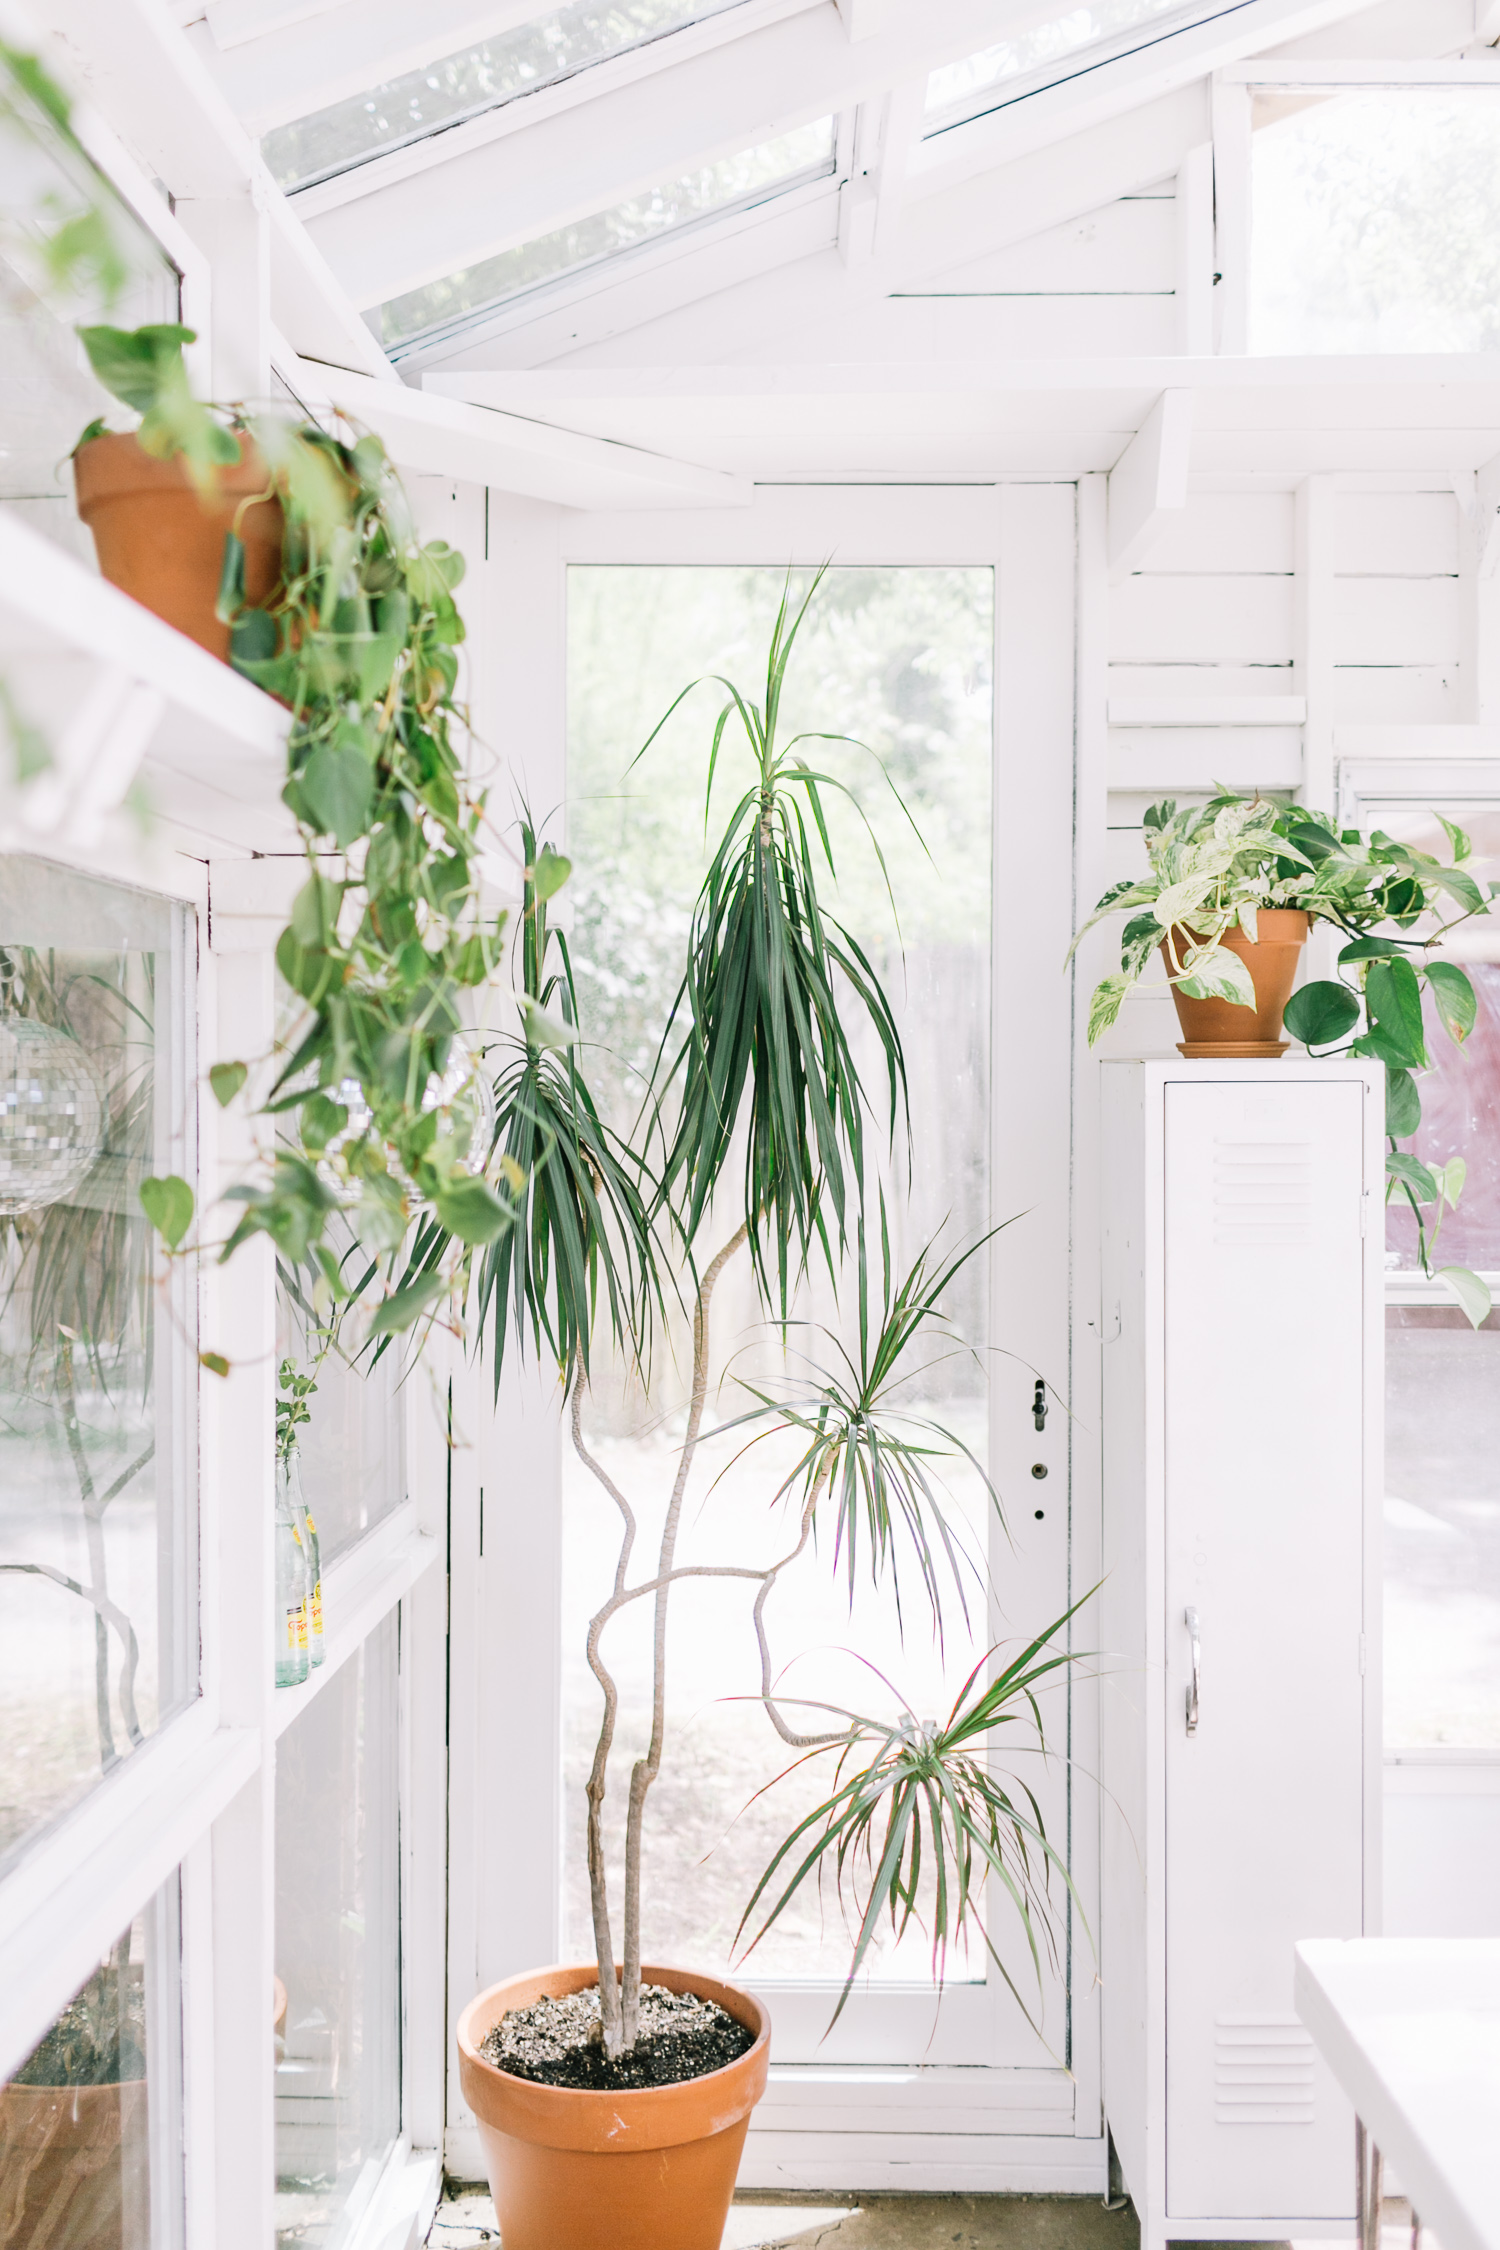 plant care tips & tricks